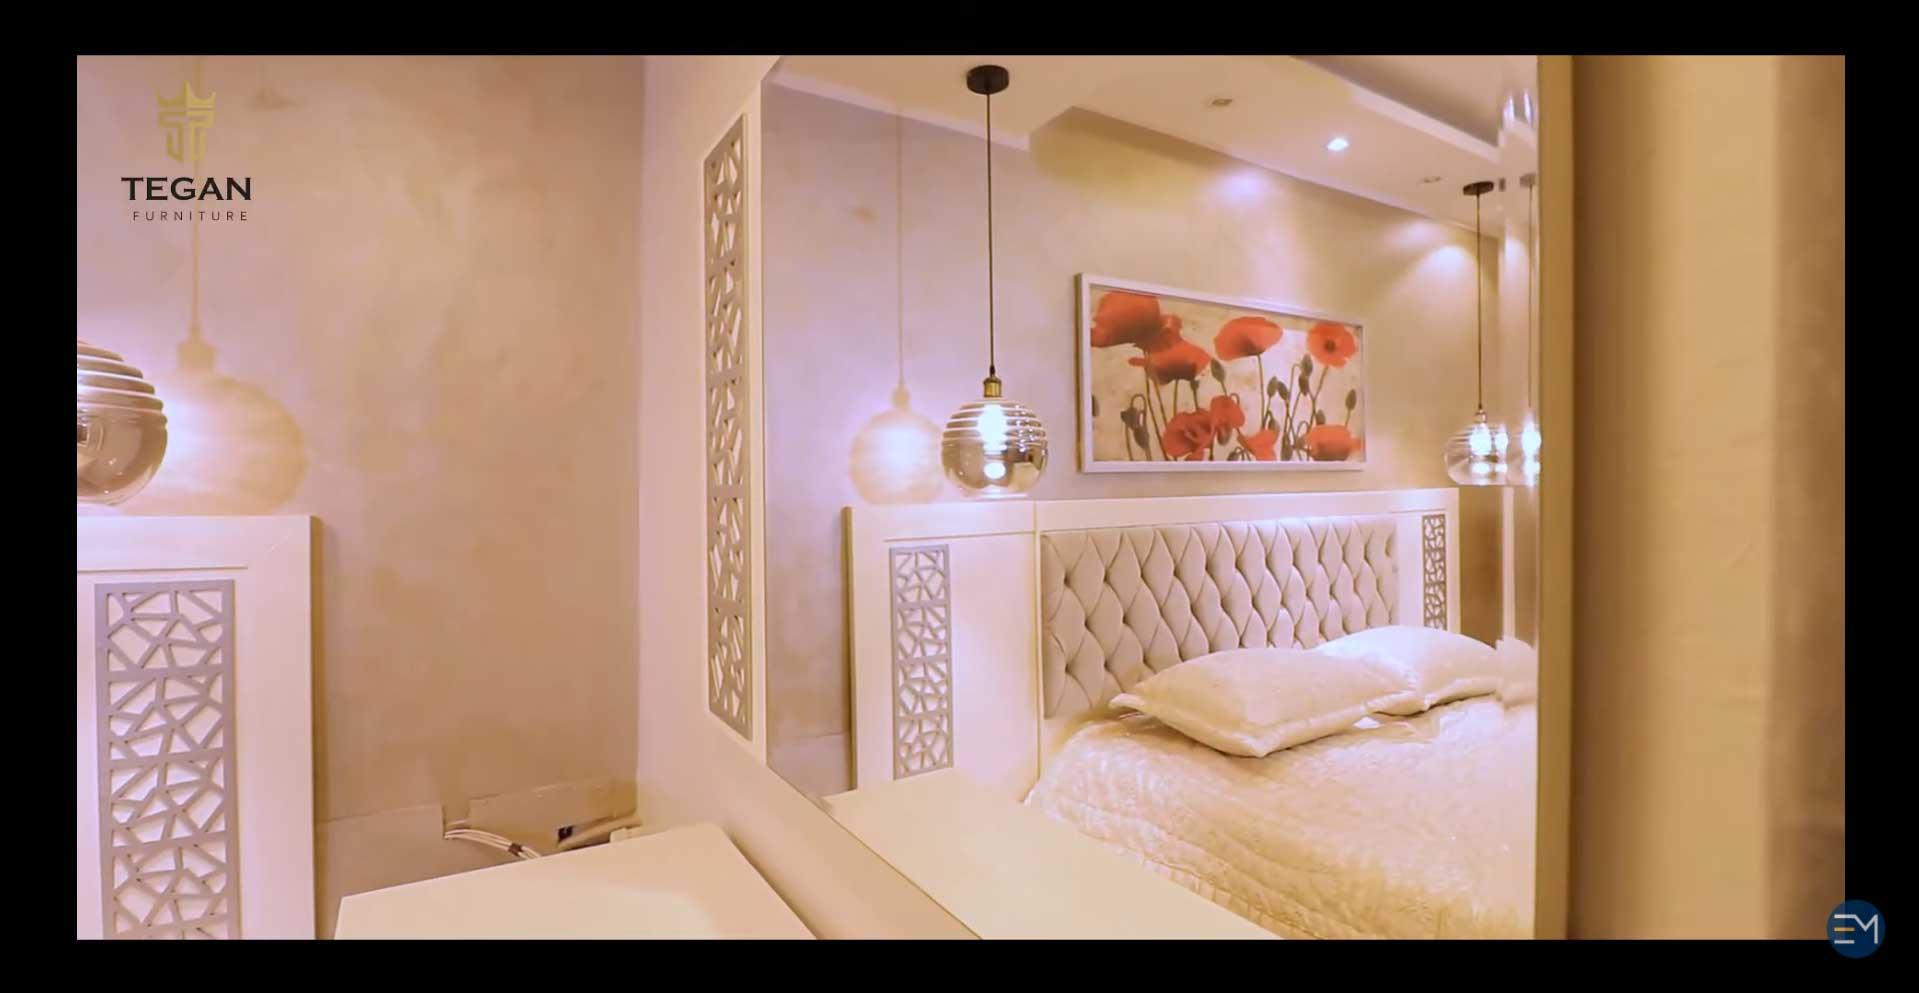 Tegan Furniture 2 - إنتاج الفيديوهات -